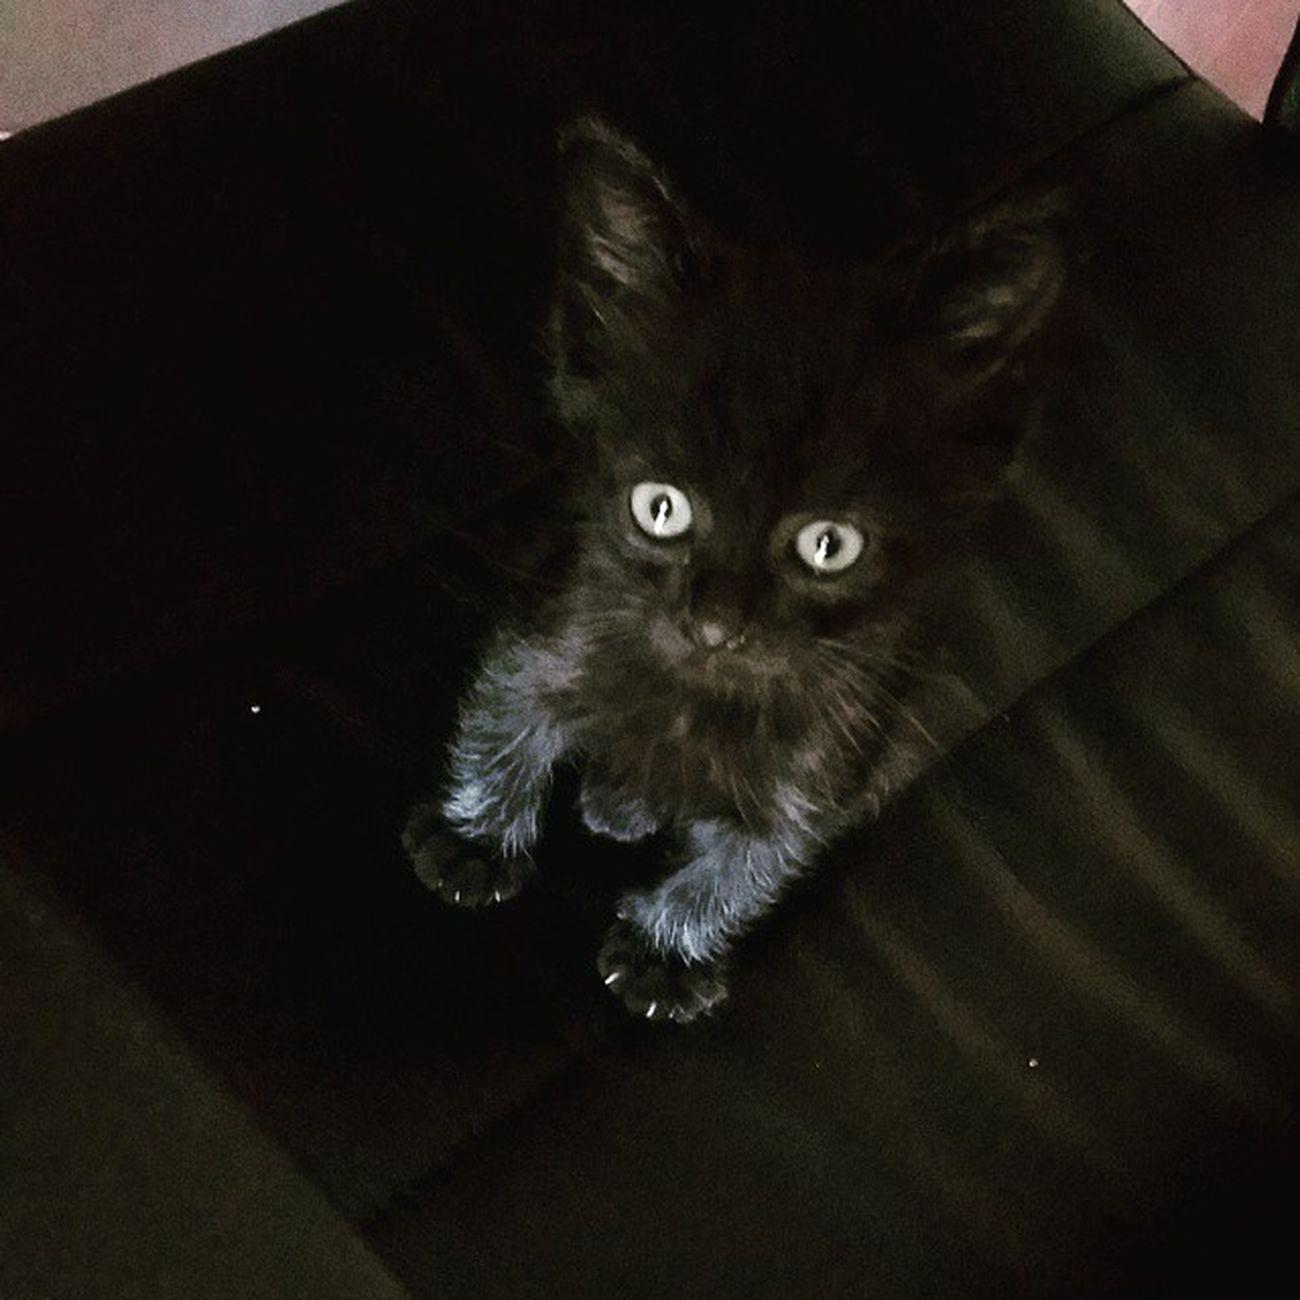 Lillo Mimetismofelino Perfetto Blackcats Babycat Instapic Instapicture Instapet Picoftheday 🐱🐱🐱